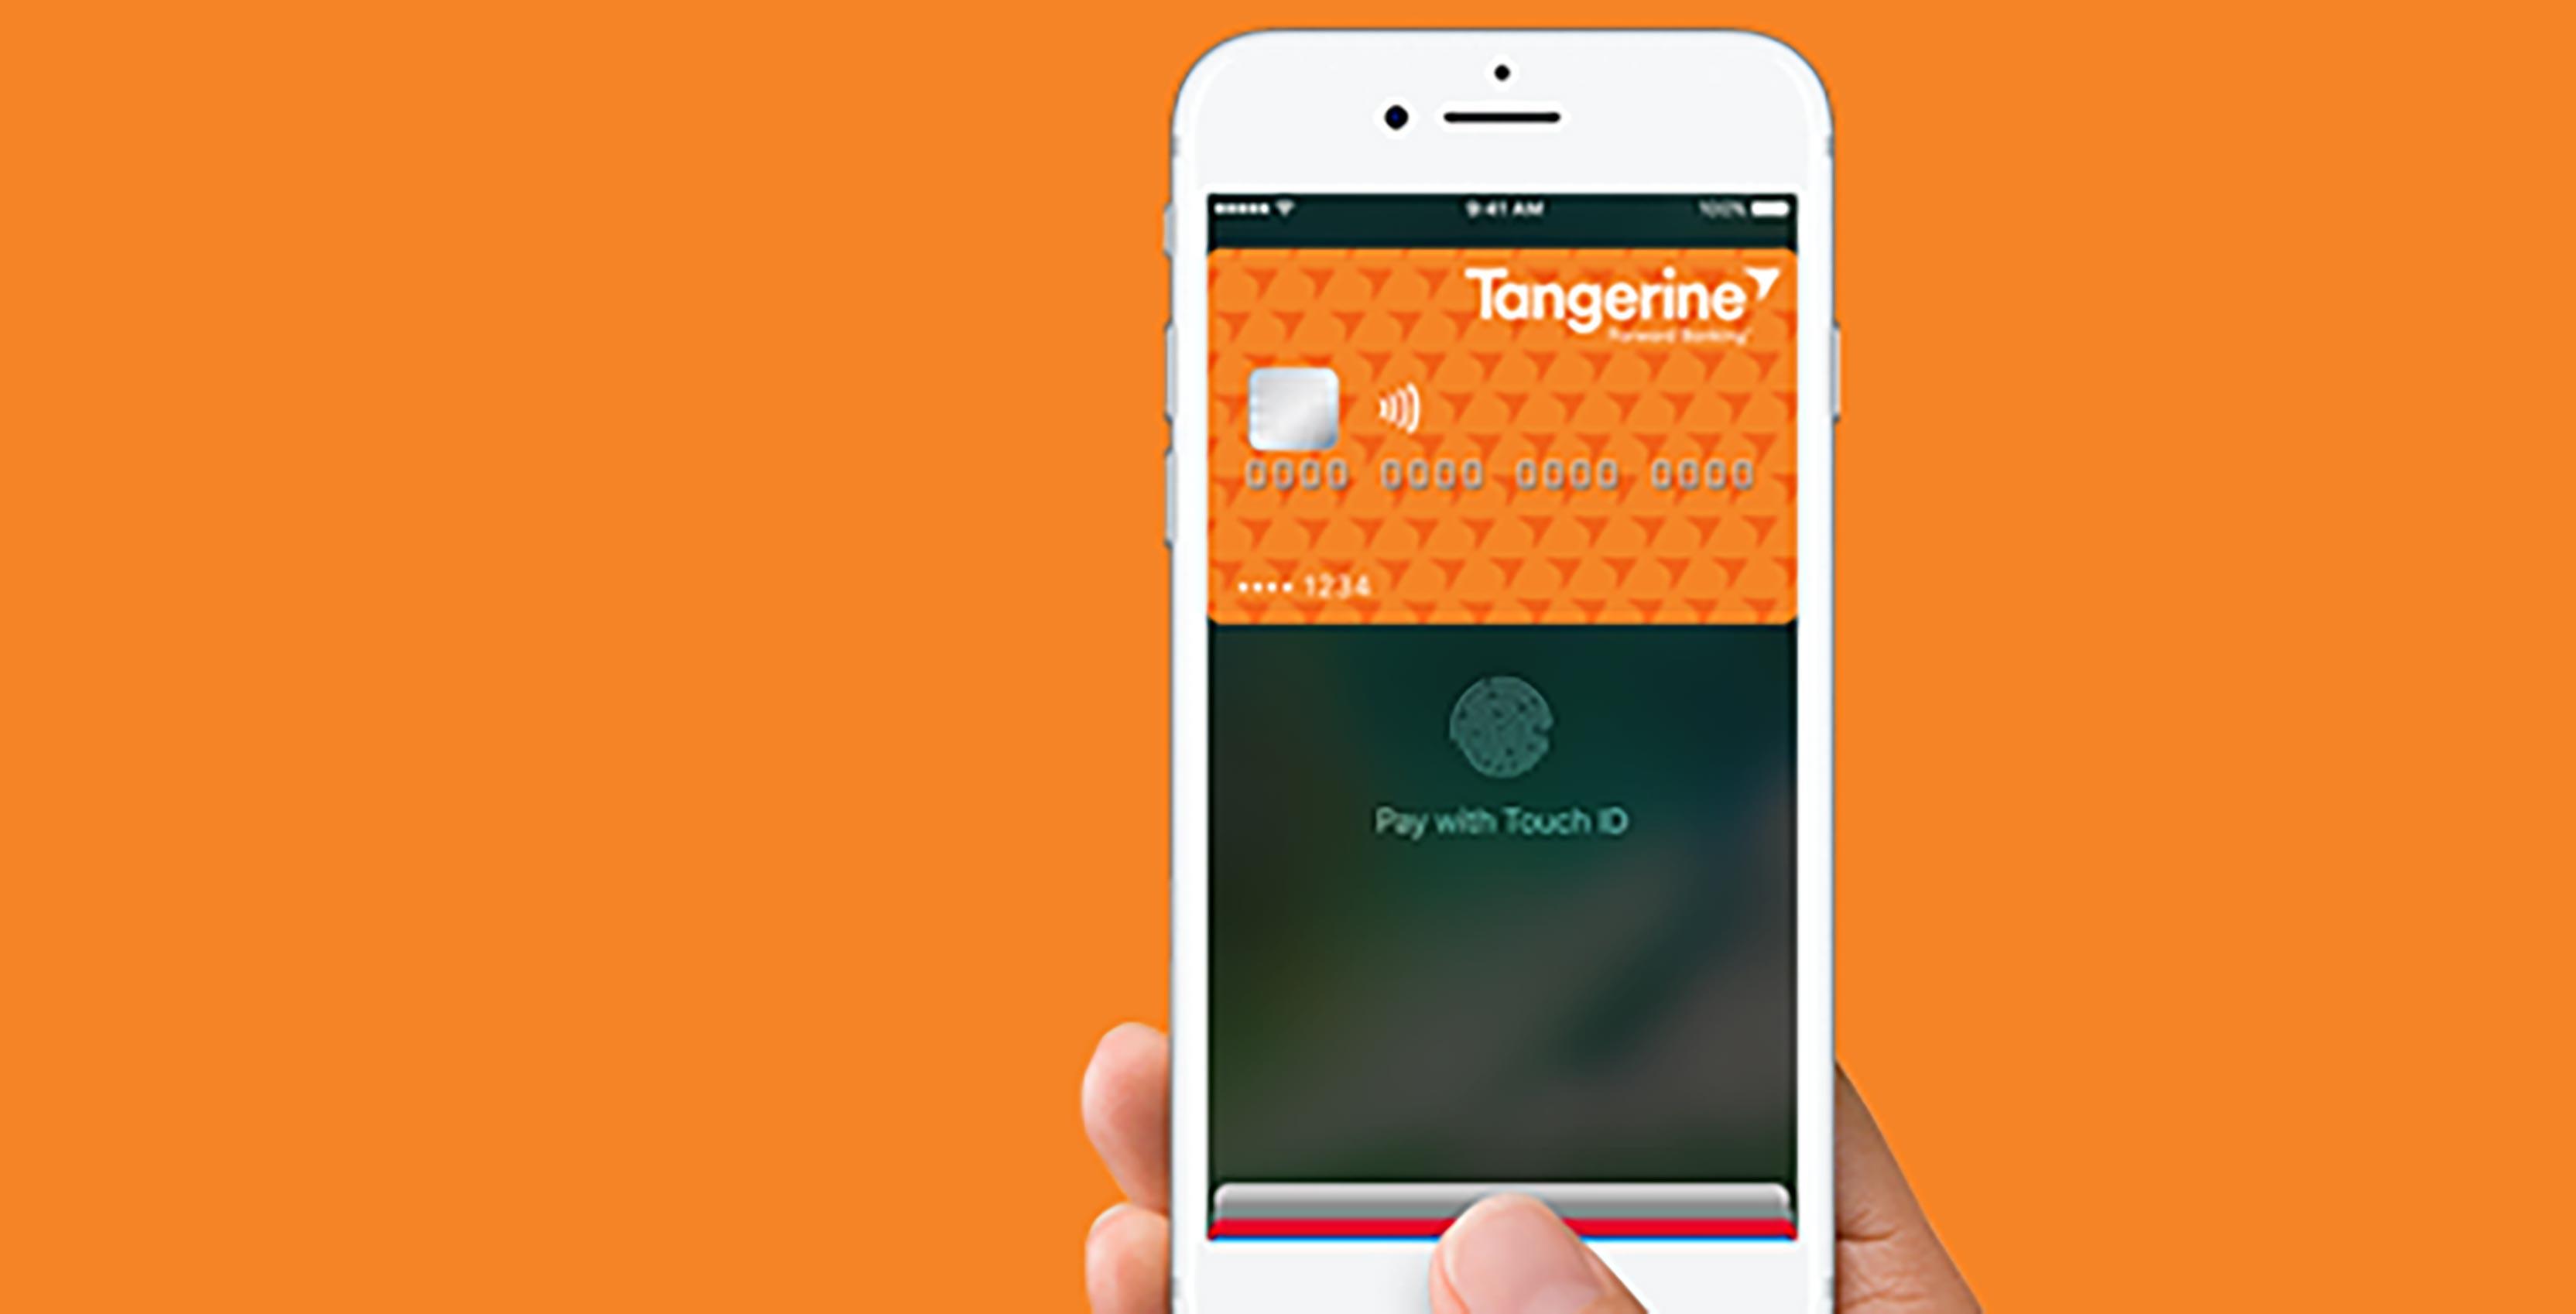 Tangerine Apple Pay on iPhone